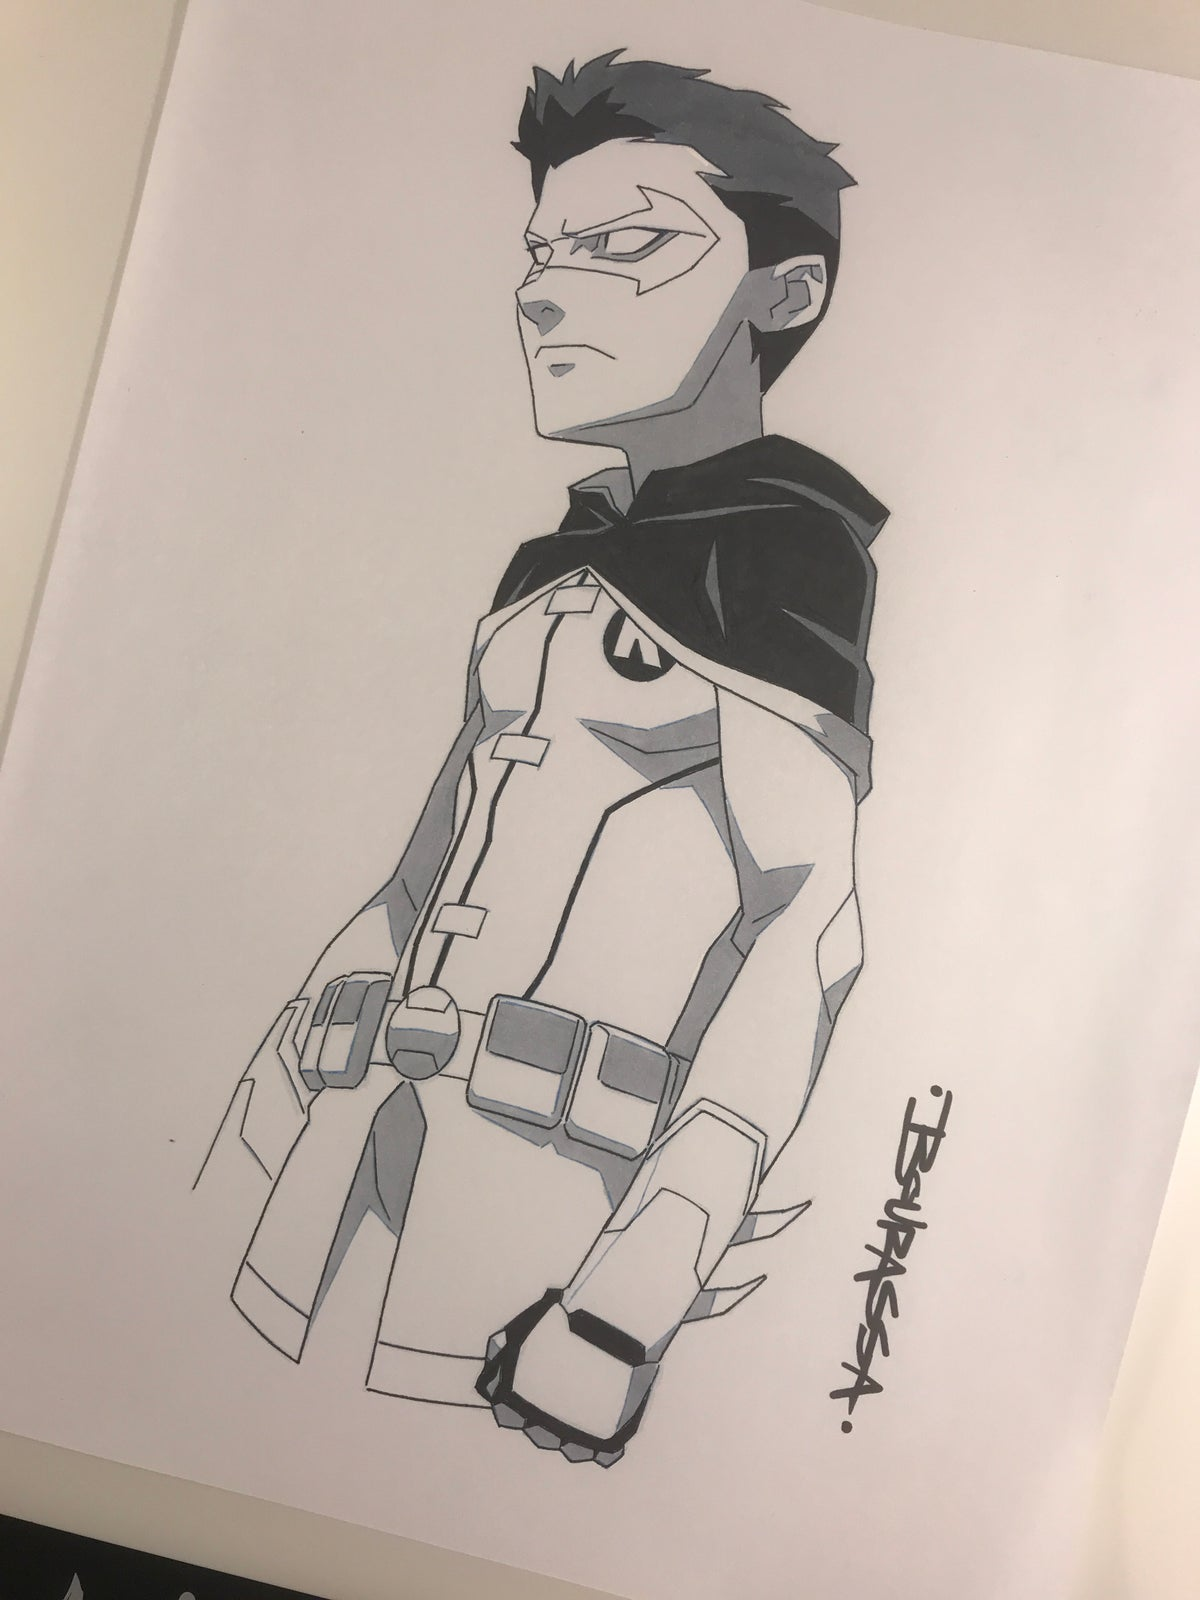 Image of Robin/Damian Wayne